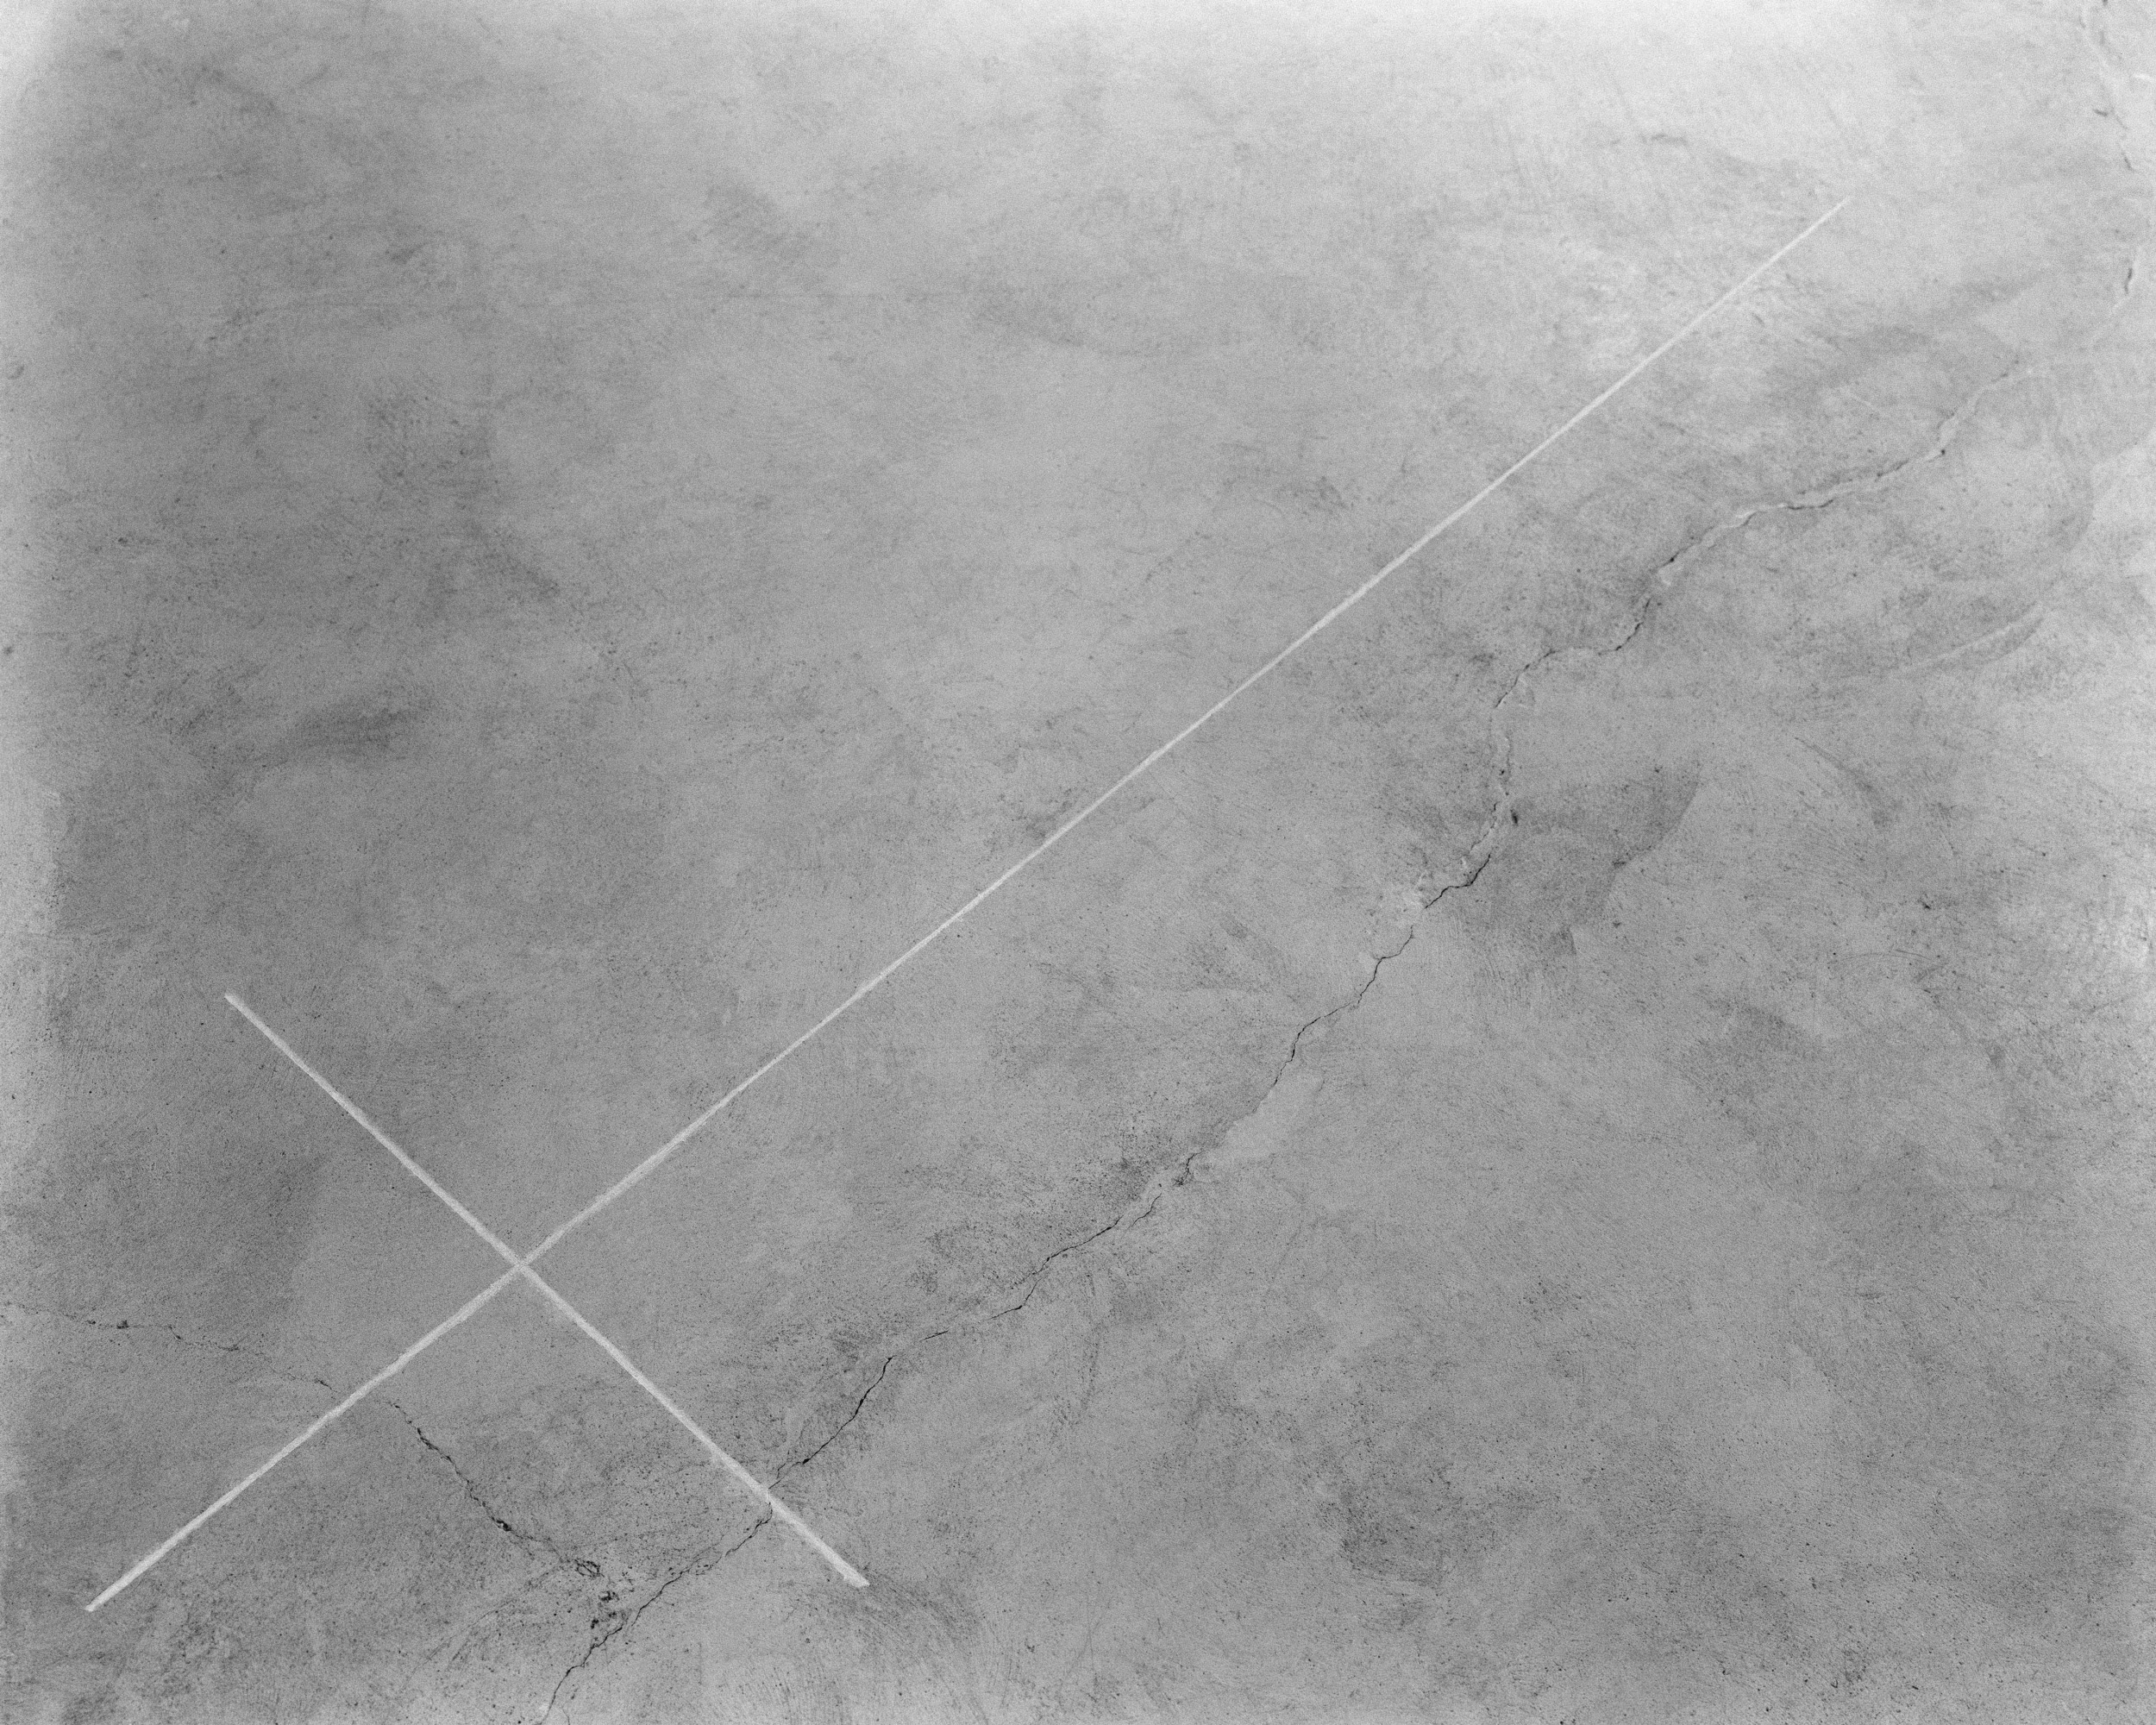 Walter De Maria, Desert Cross, El Mirage Dry Lake, 1969